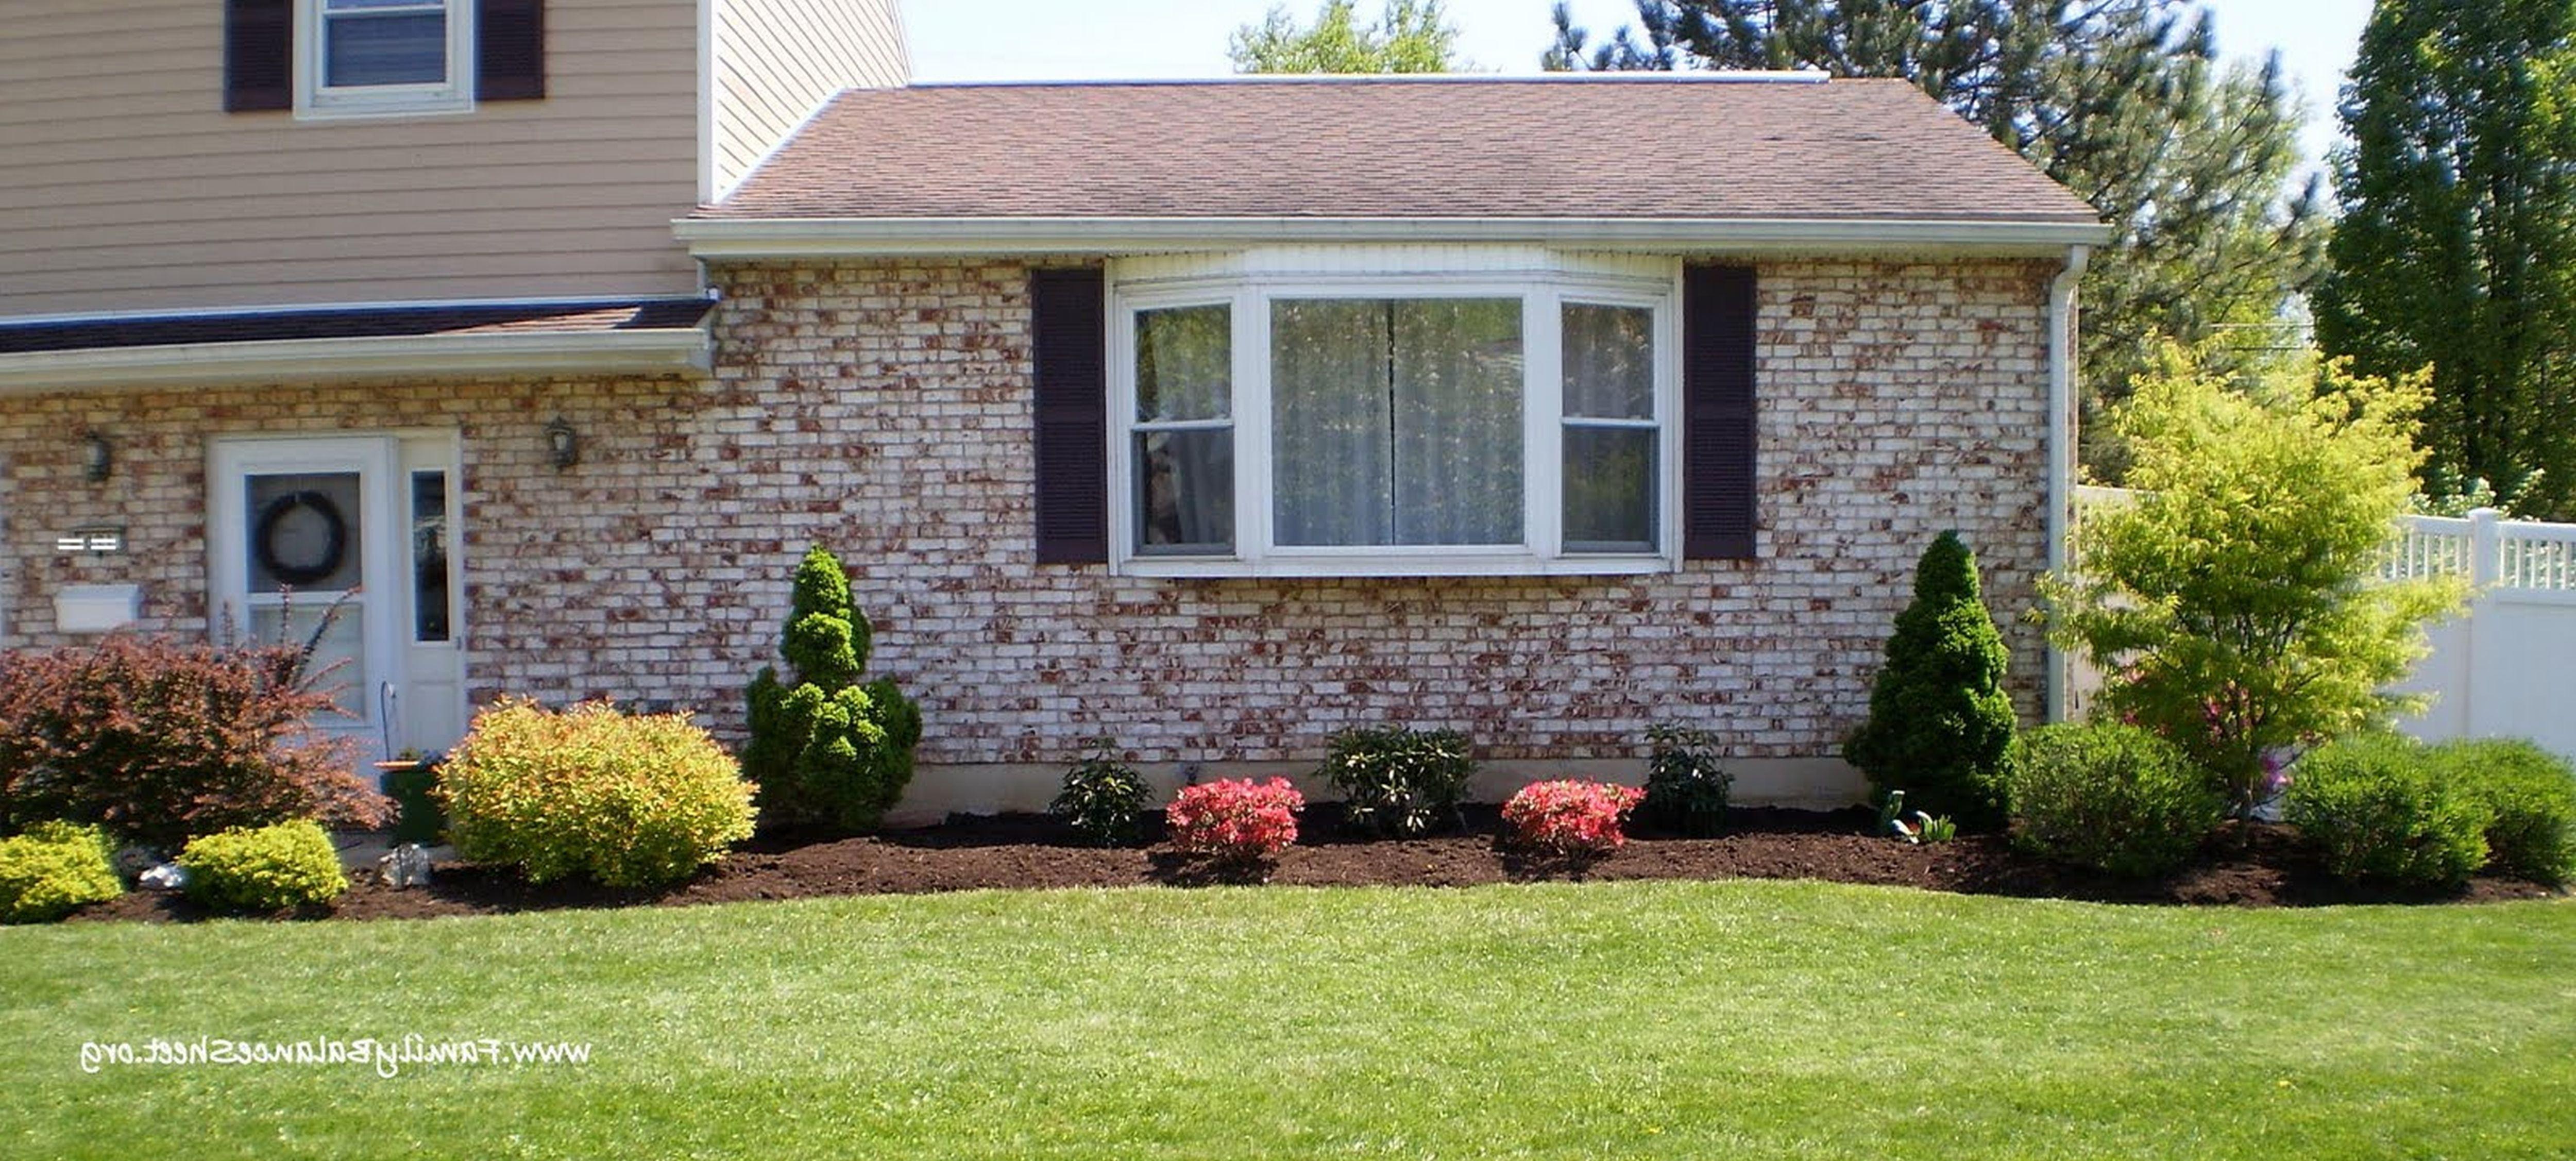 10 Awesome Landscaping Ideas For Split Level Homes 98 simple landscaping ideas for ranch style home garden garden 2020